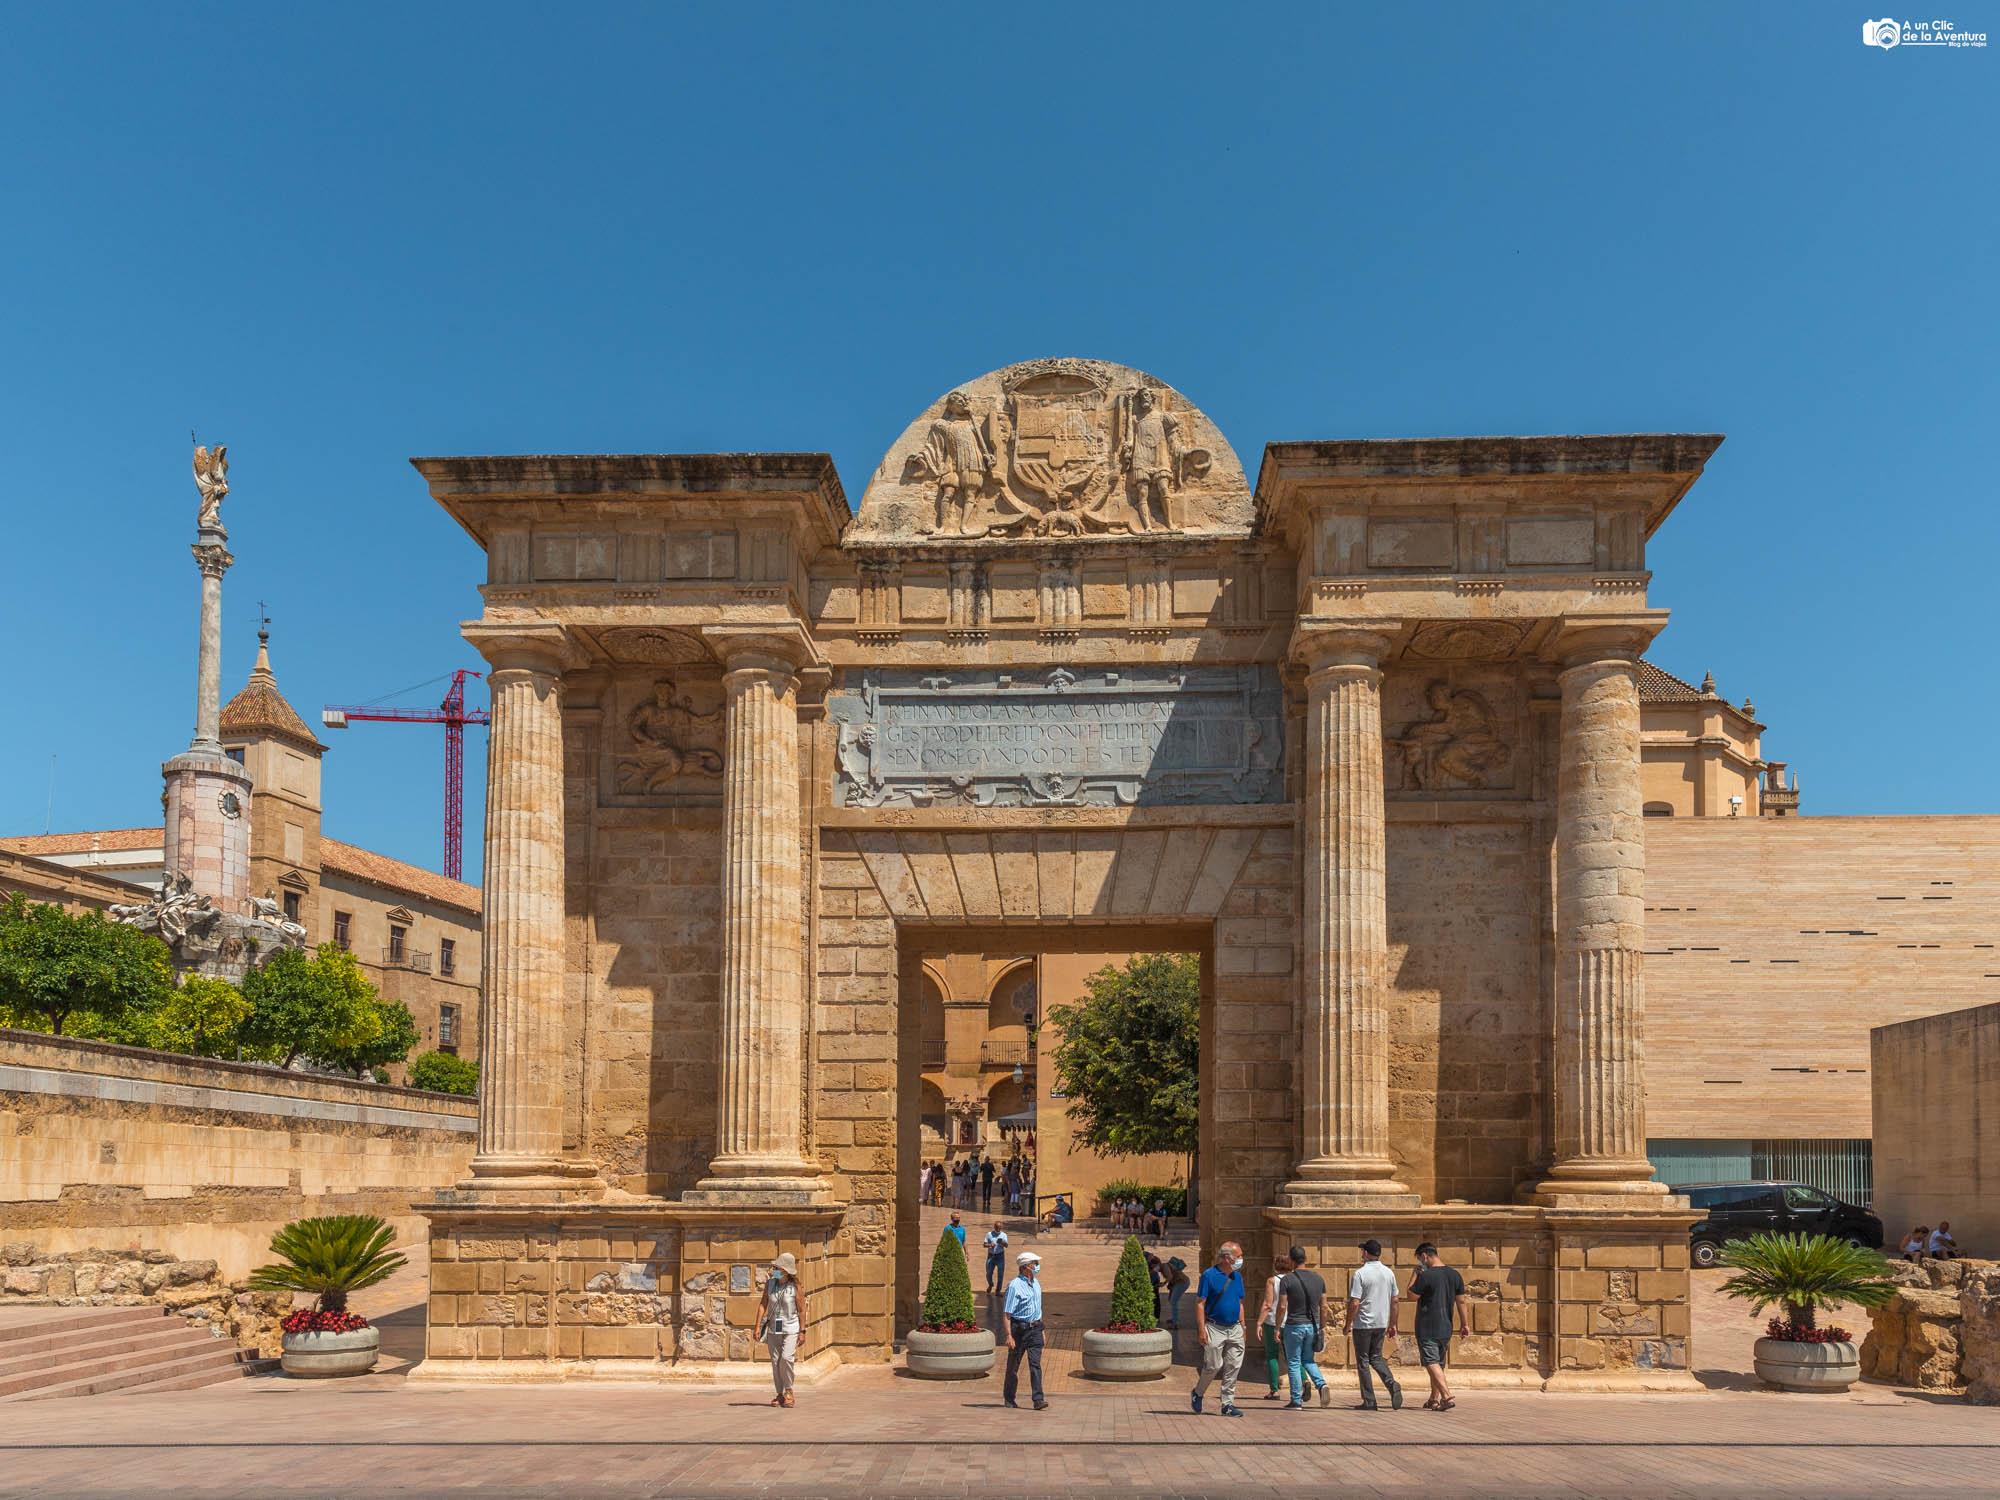 Puerta del Puente de Córdoba